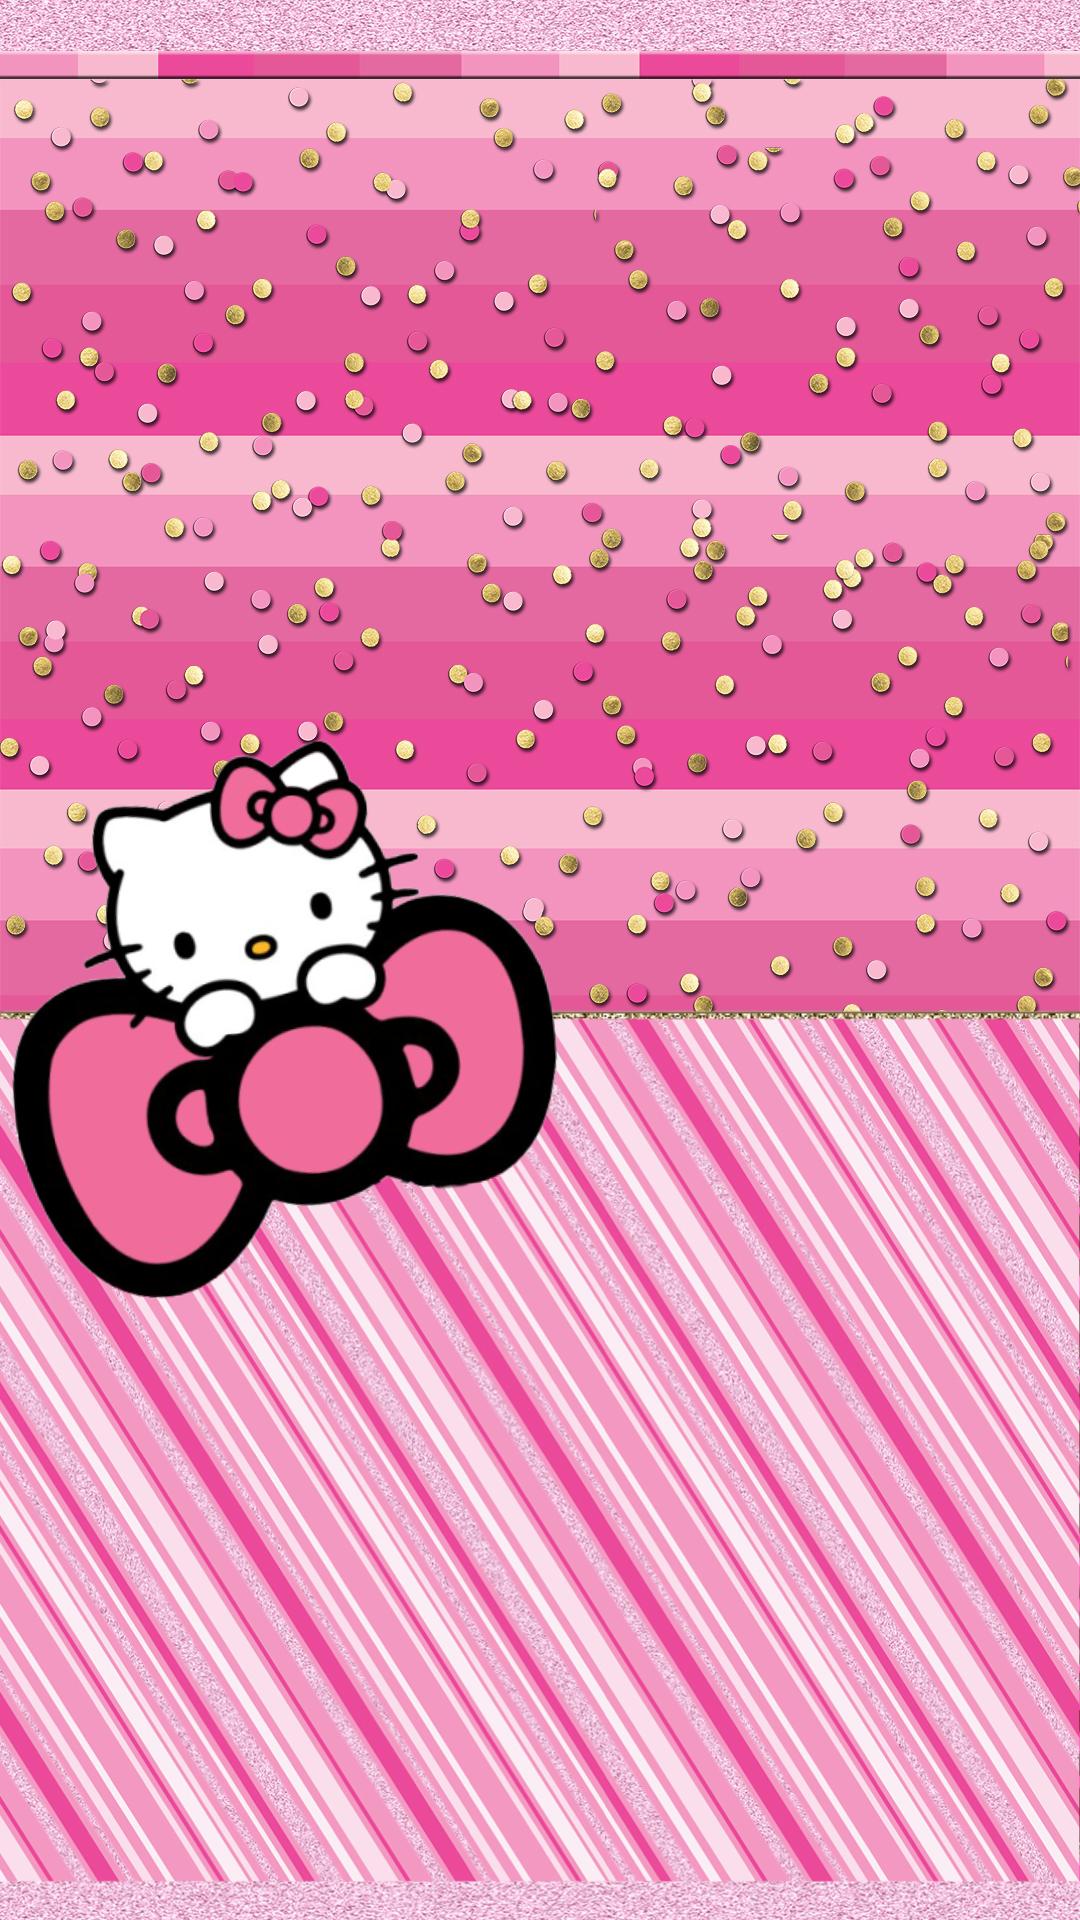 Wallpaper I Made Enjoy Wallpaper Hello Kitty Backgrounds Hello Kitty Pictures Hello Kitty Wallpaper